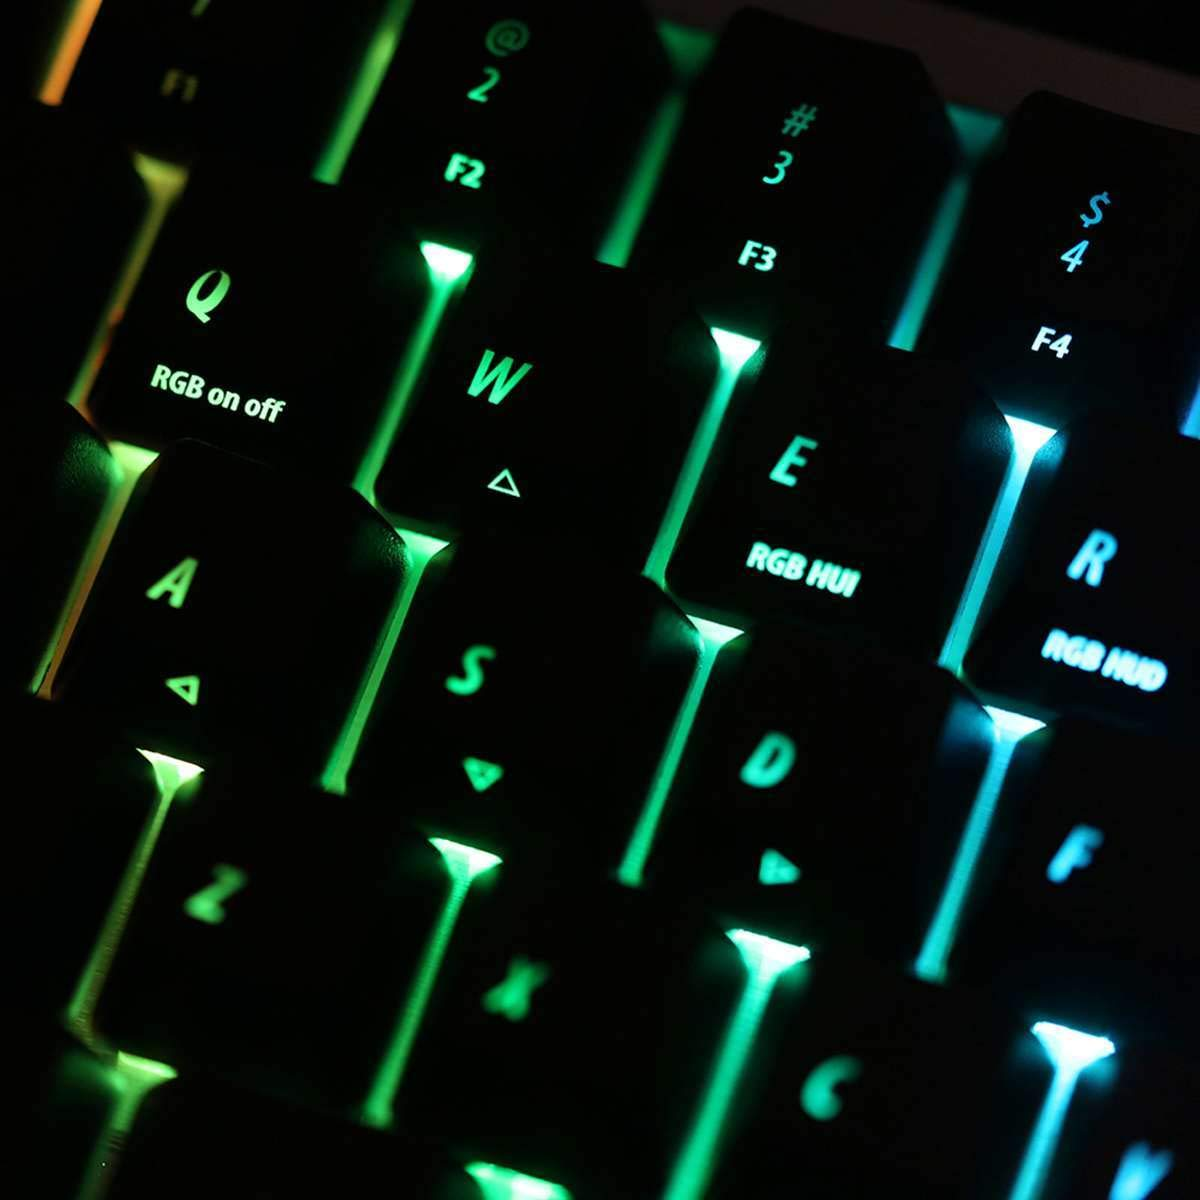 S SKYEE Merchanical Gaming Keyboard Keycaps 64 Key Light Translucent ABS Keycaps OEM Profile Keycap Set